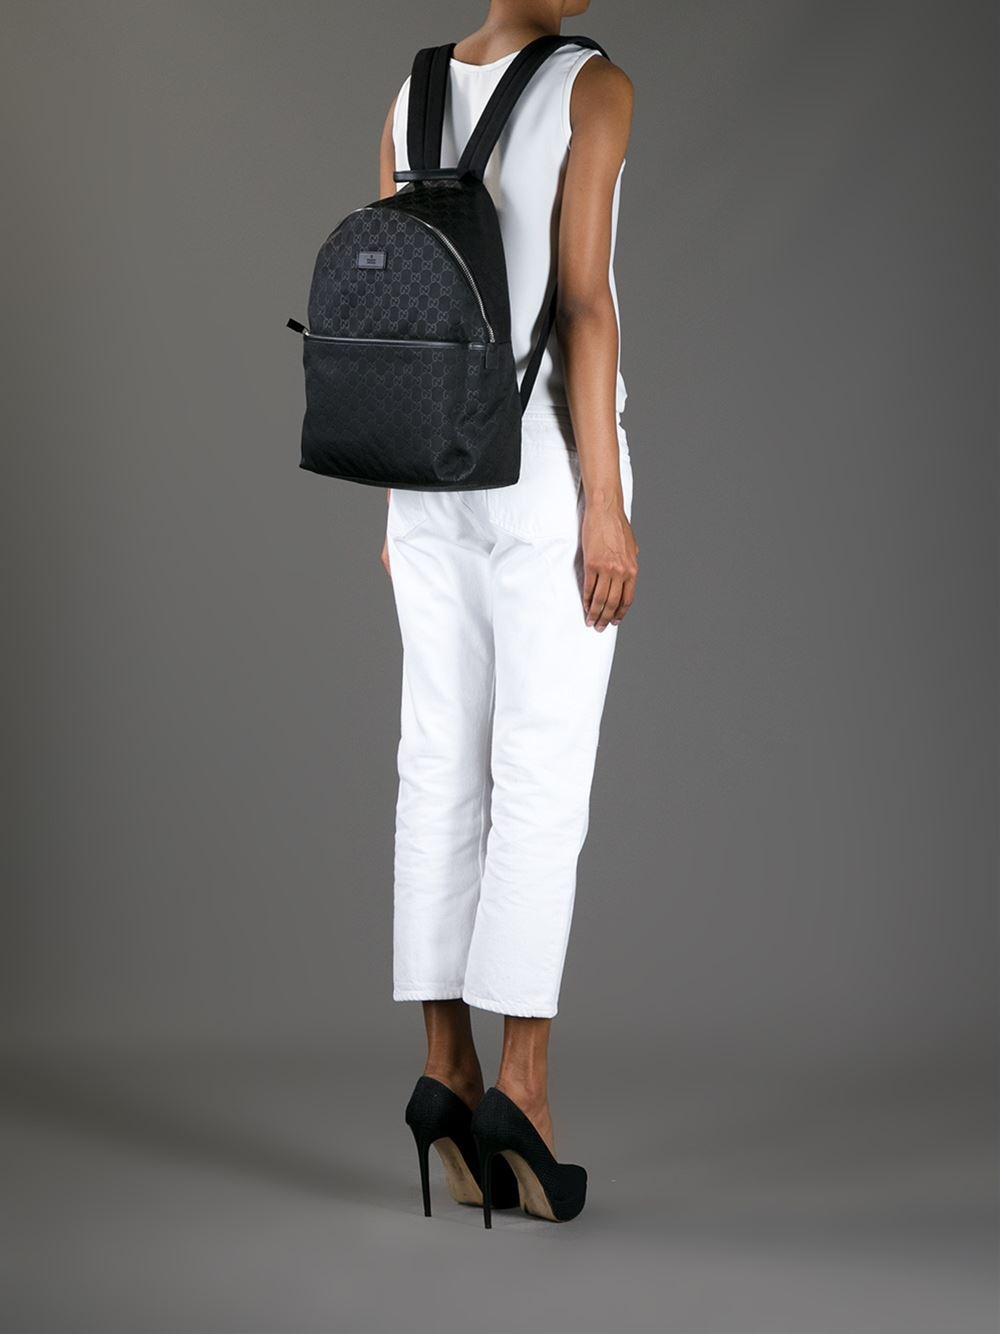 5ea7f3c21e51 Gucci Embossed Monogram Backpack in Black - Lyst